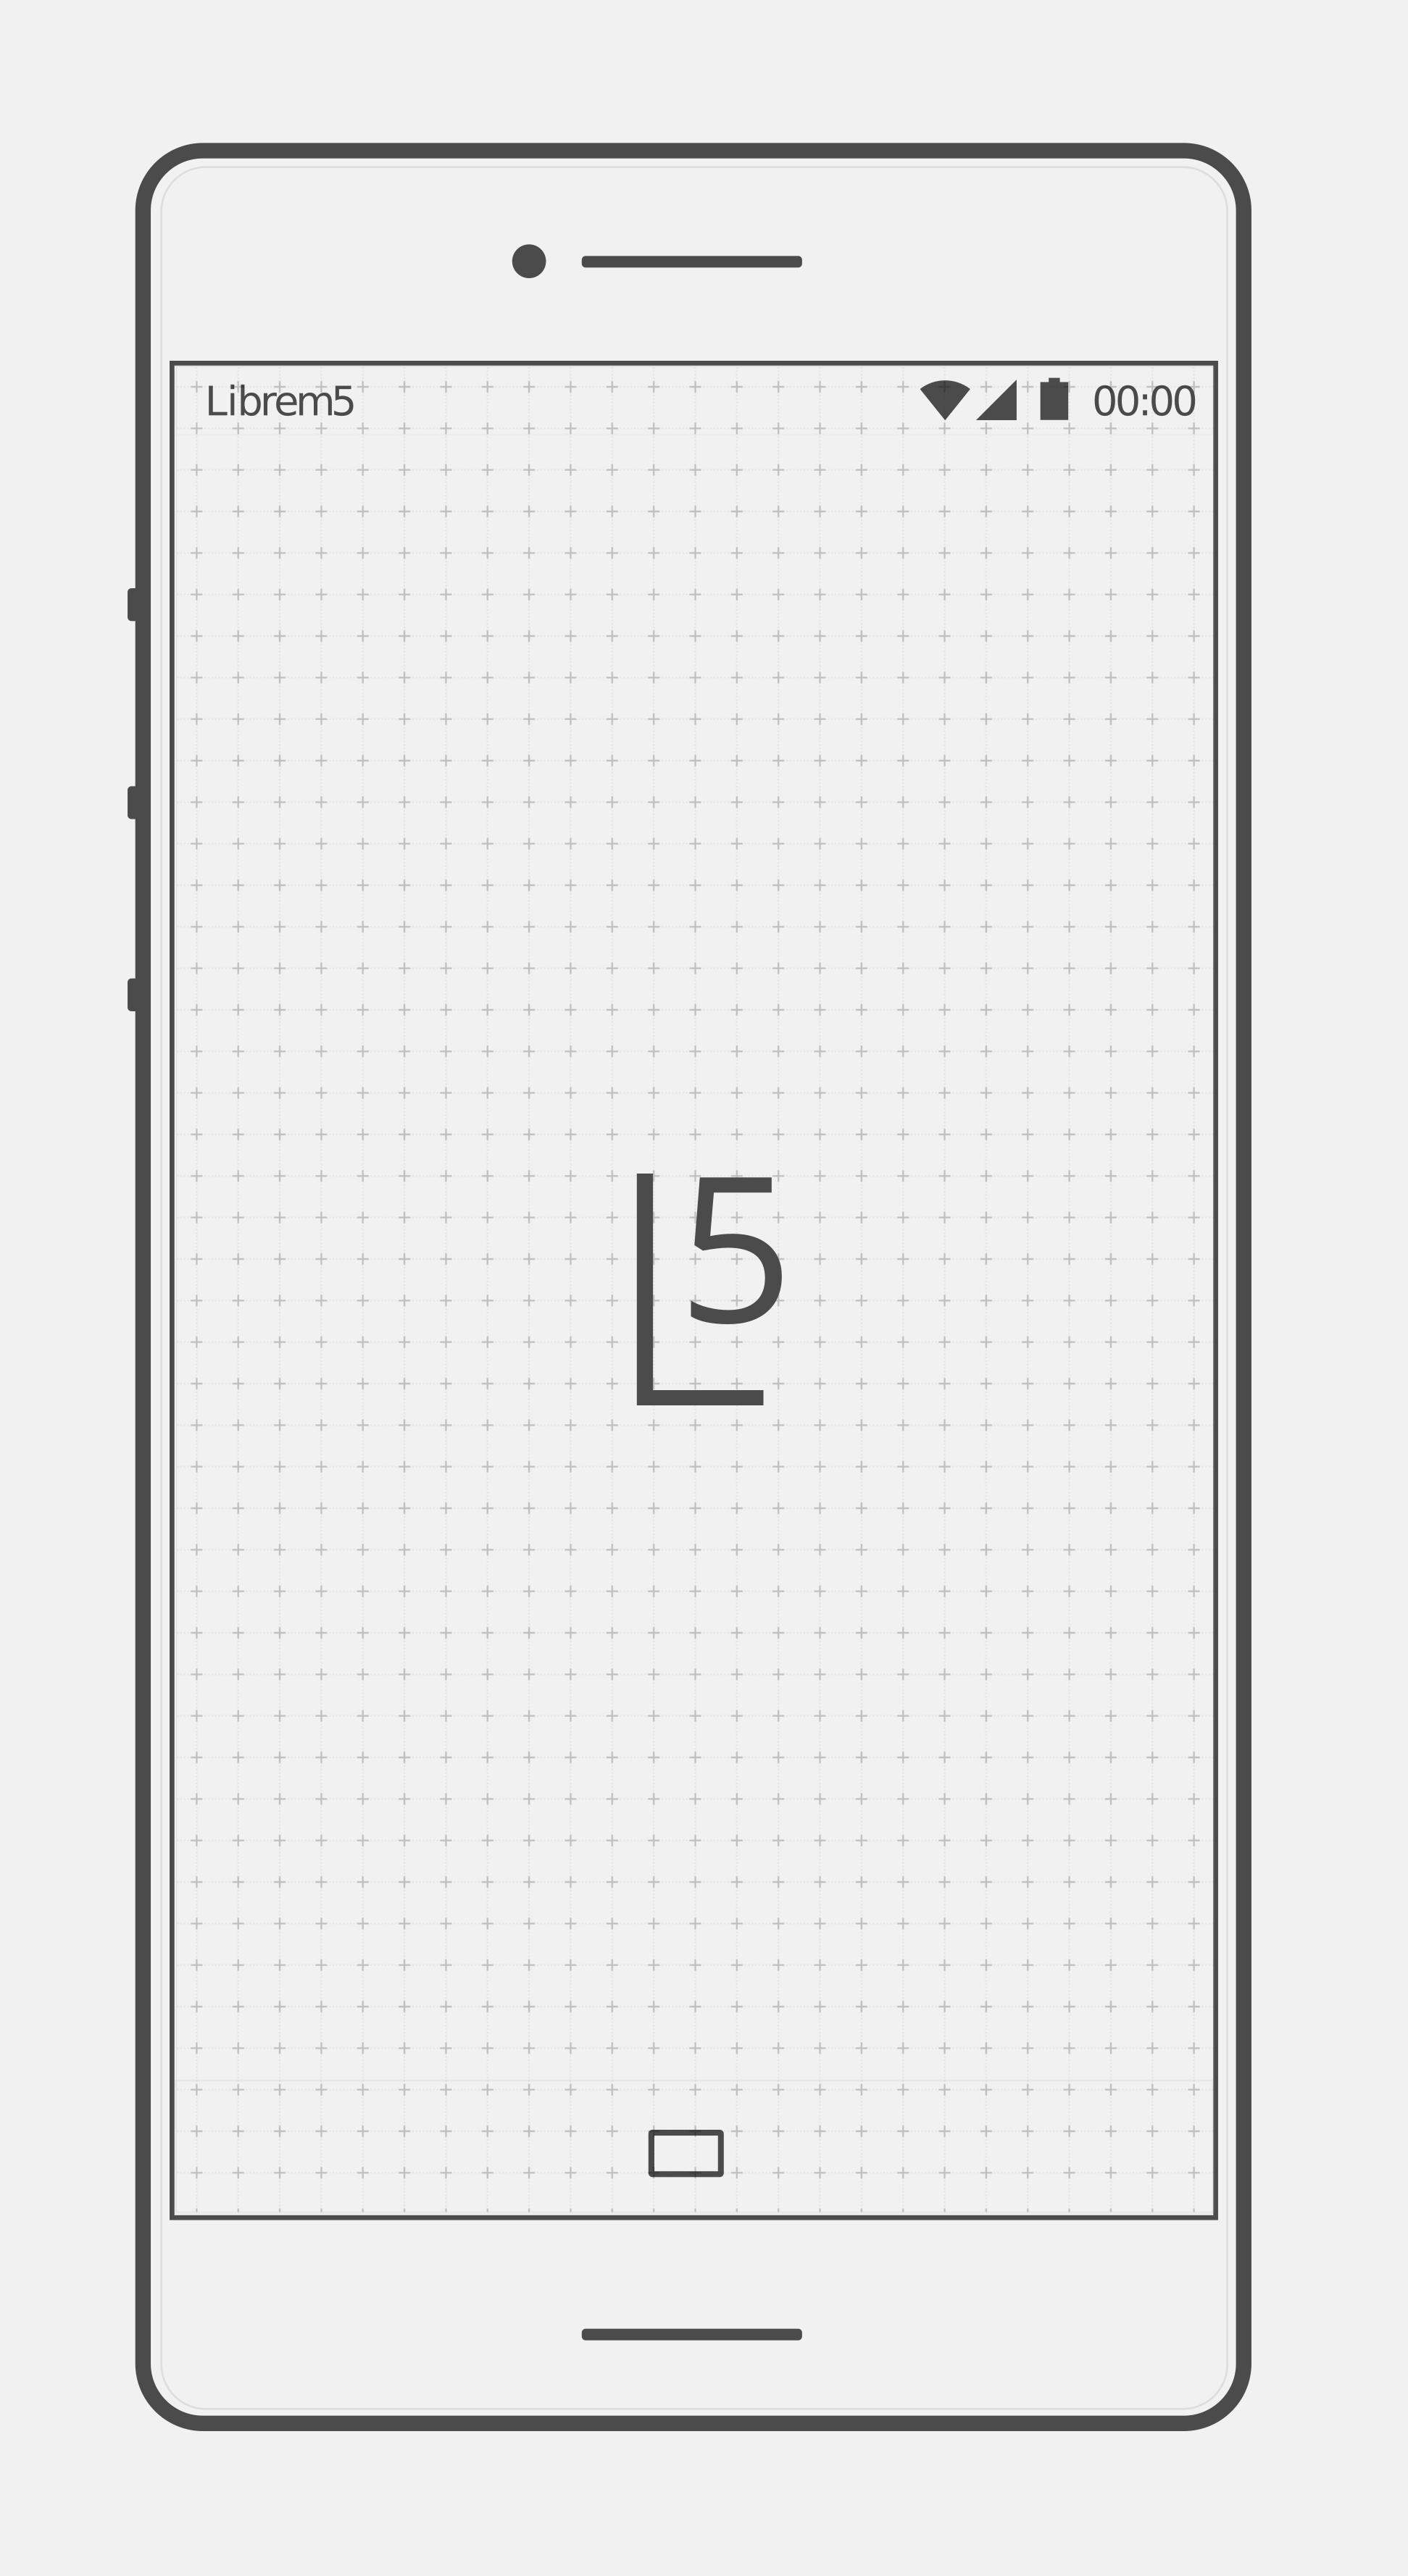 Design/Design_guidelines/gesture_pics/p1f1.png